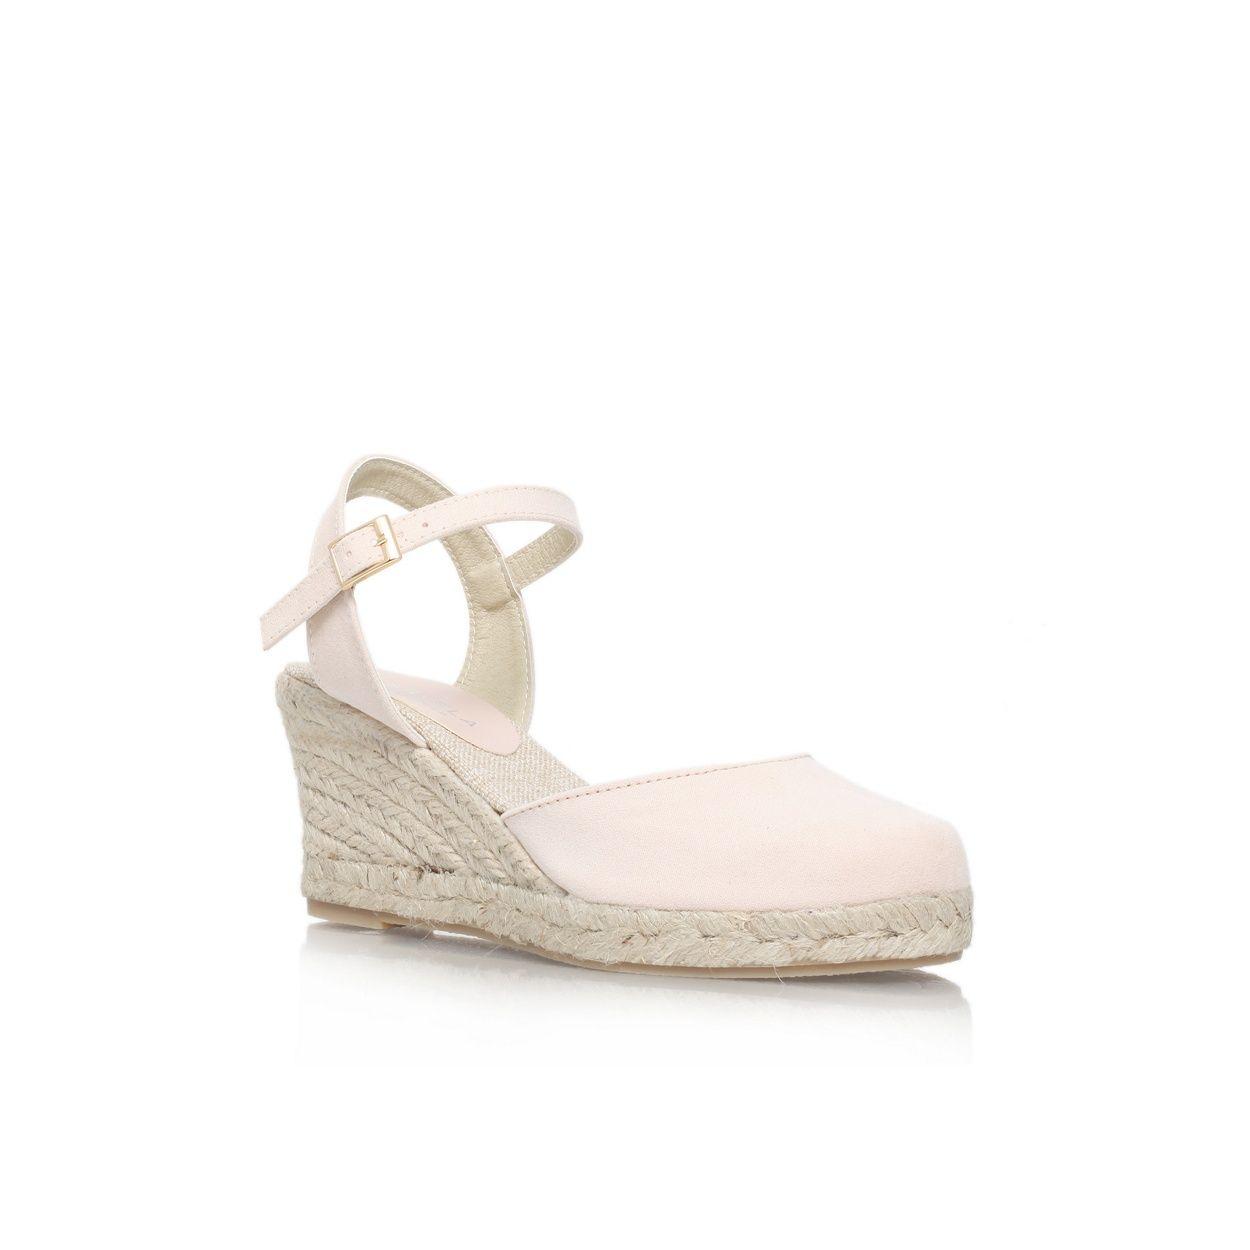 008999173b Nude 'Sabrina' low wedge heel court shoe.   Wedge Heels   Shoes ...